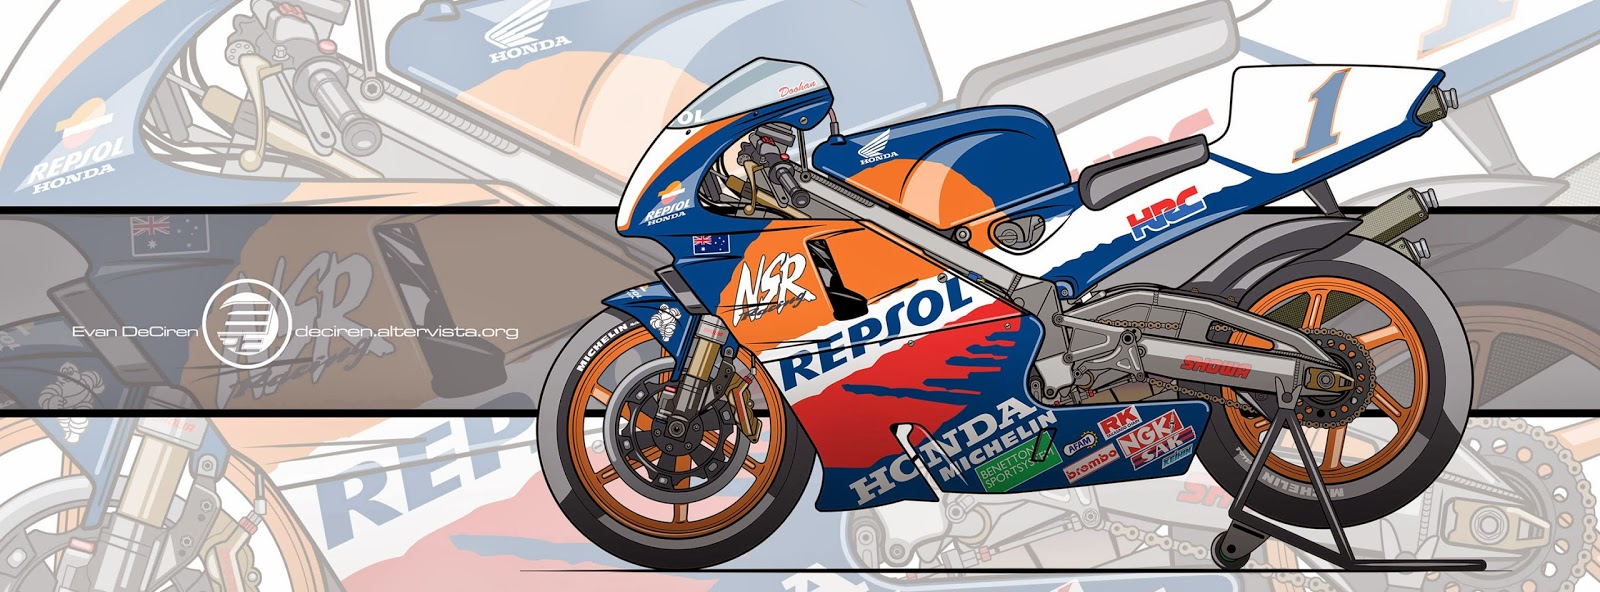 Racing Cafè Motorcycle Art Honda Nsr 500 1996 By Evan Deciren